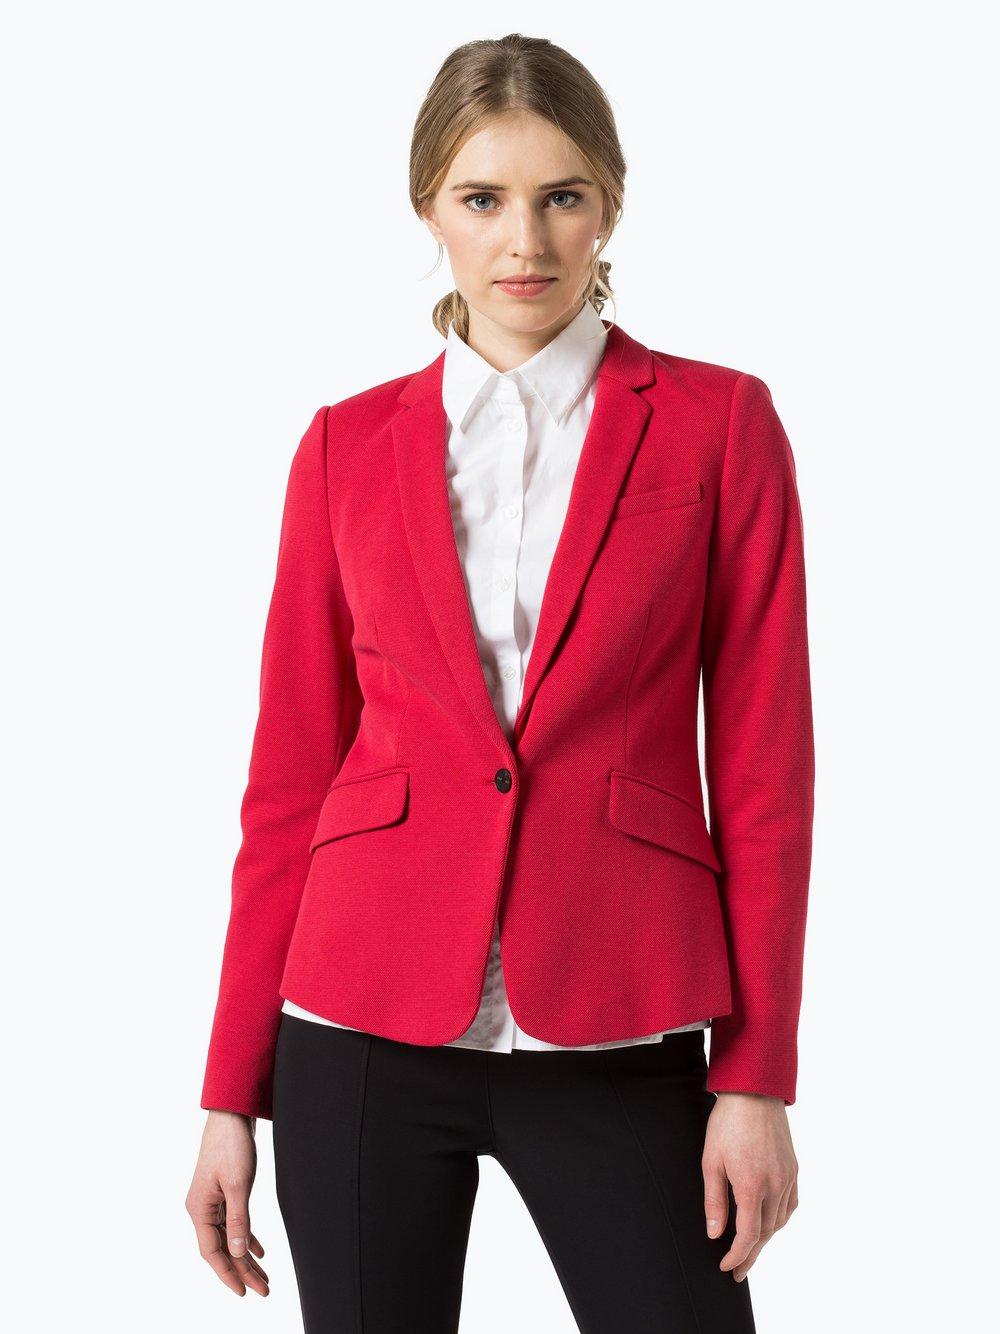 Damen Blazer rot Esprit 3xWH0Lz